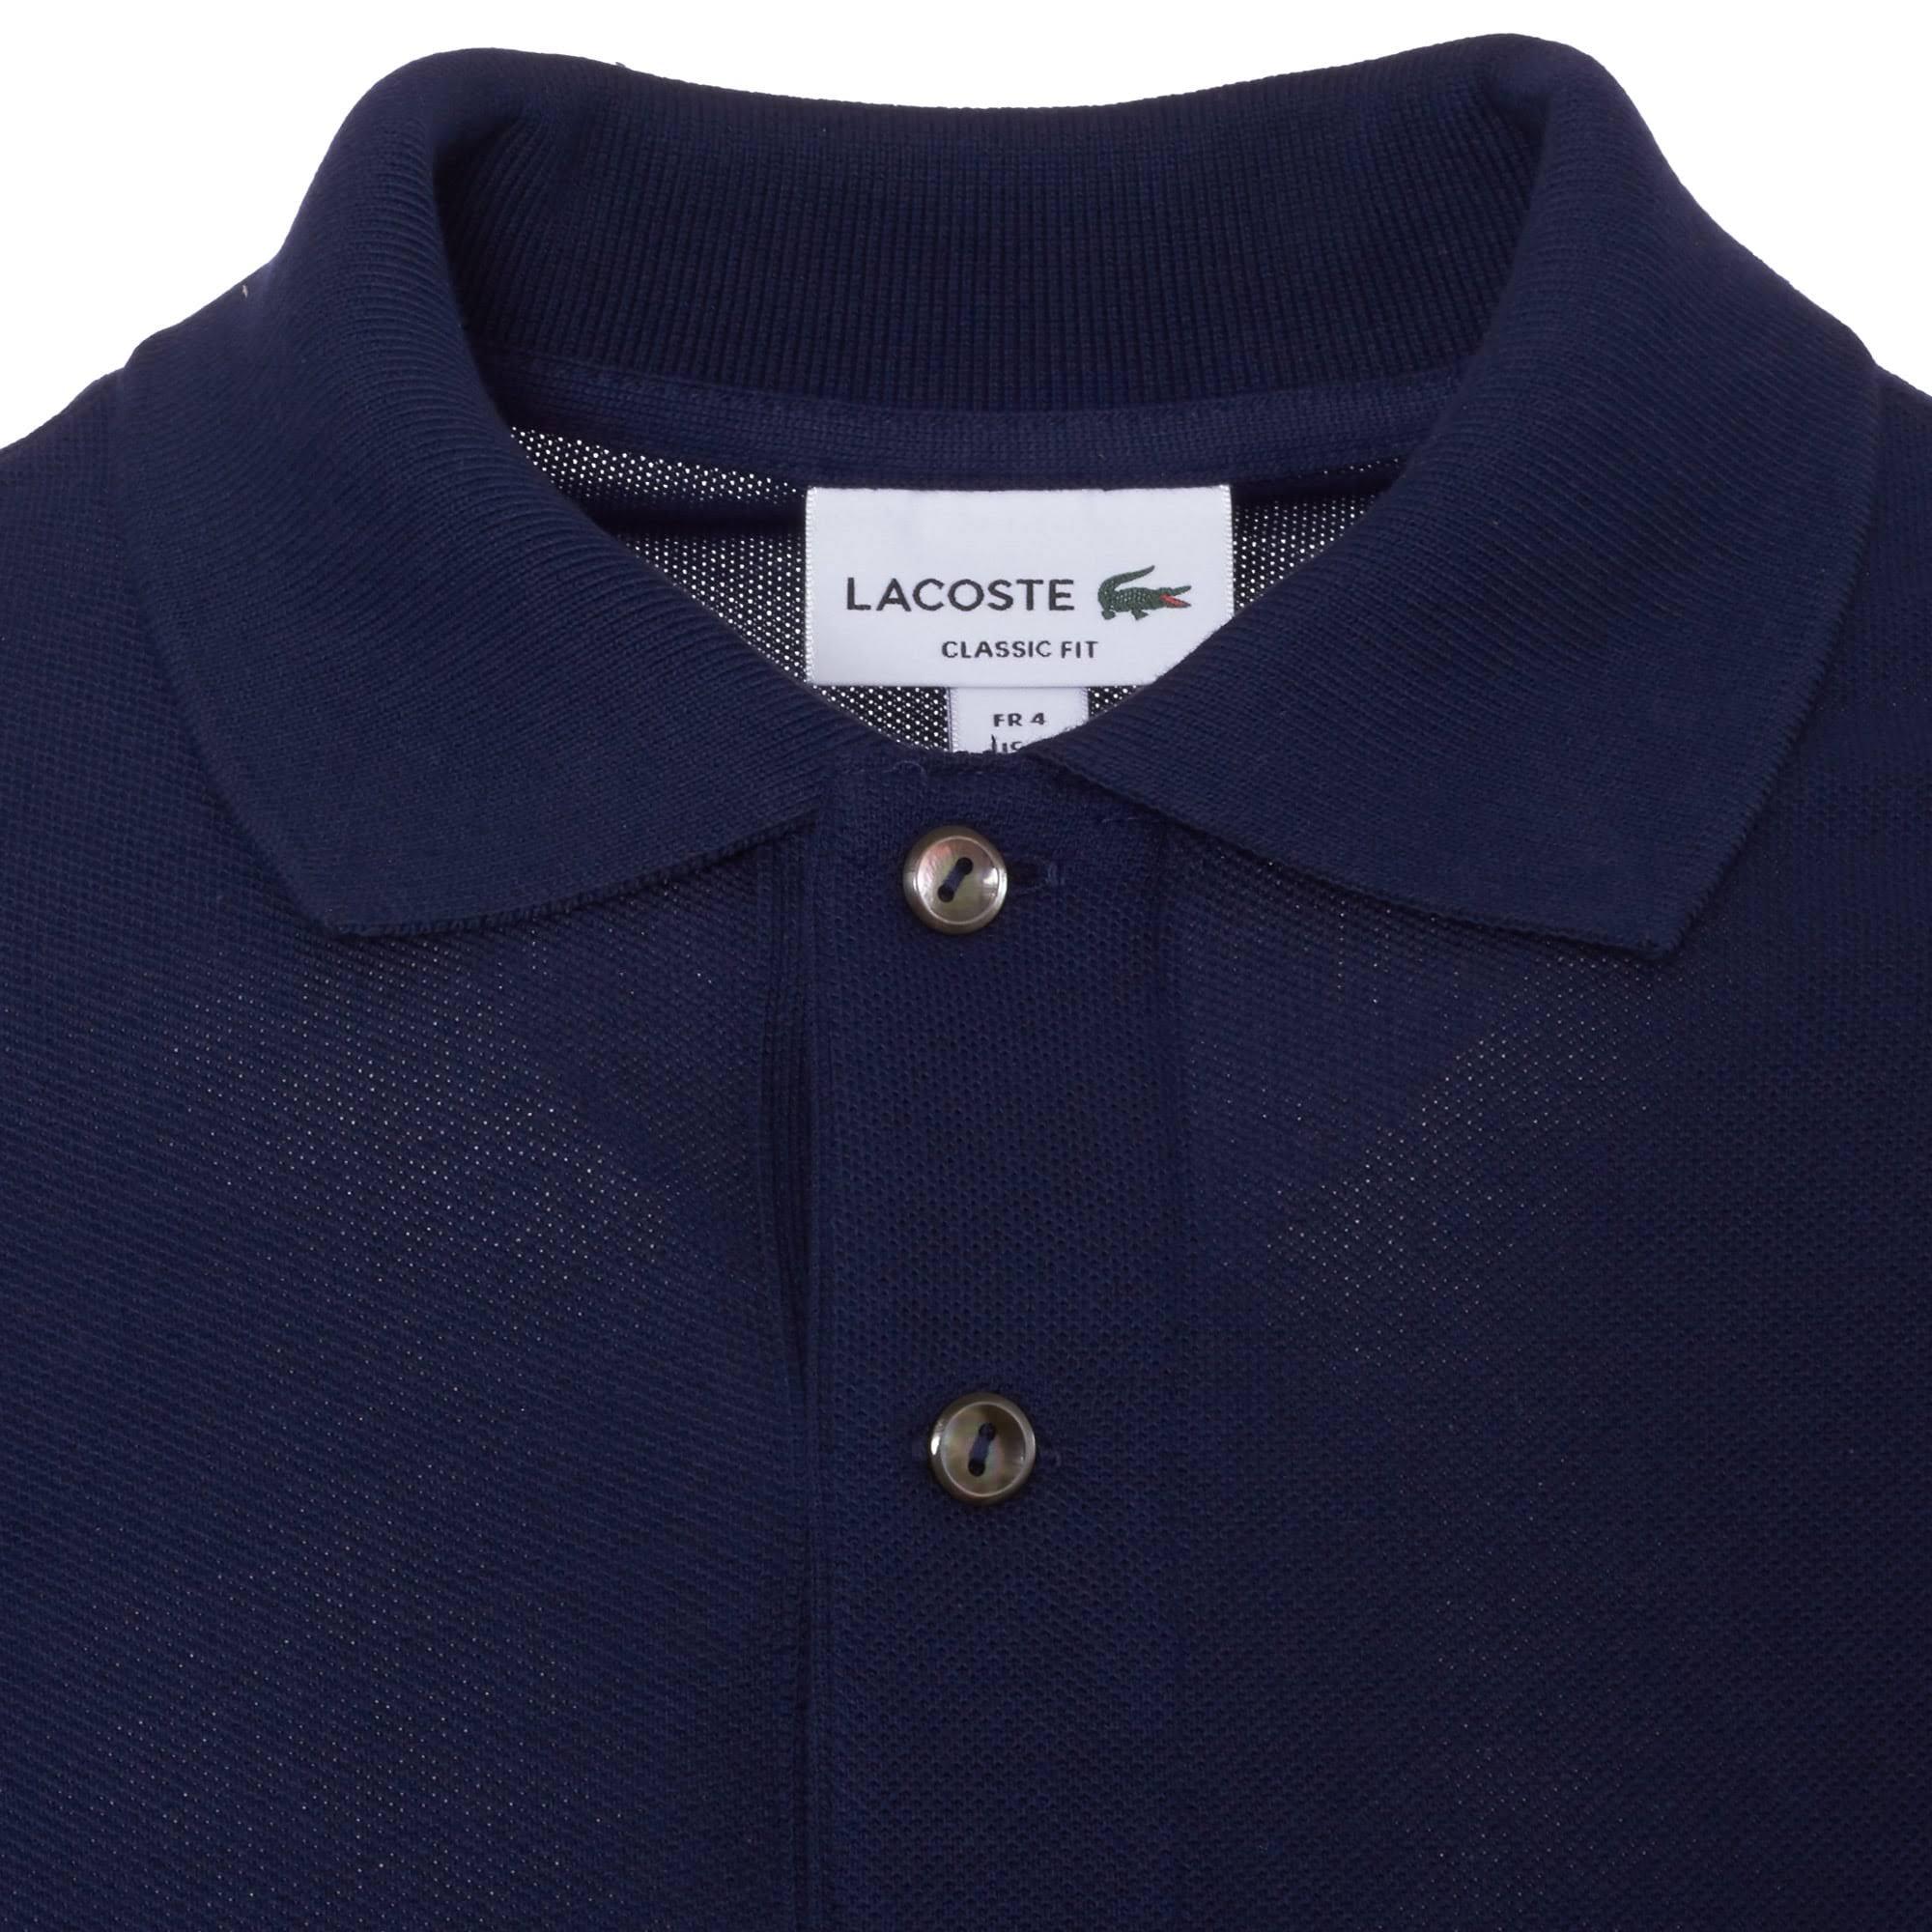 Dunkelblau Polo Lacoste Lacoste T Polo shirt fTXO7qnxSw